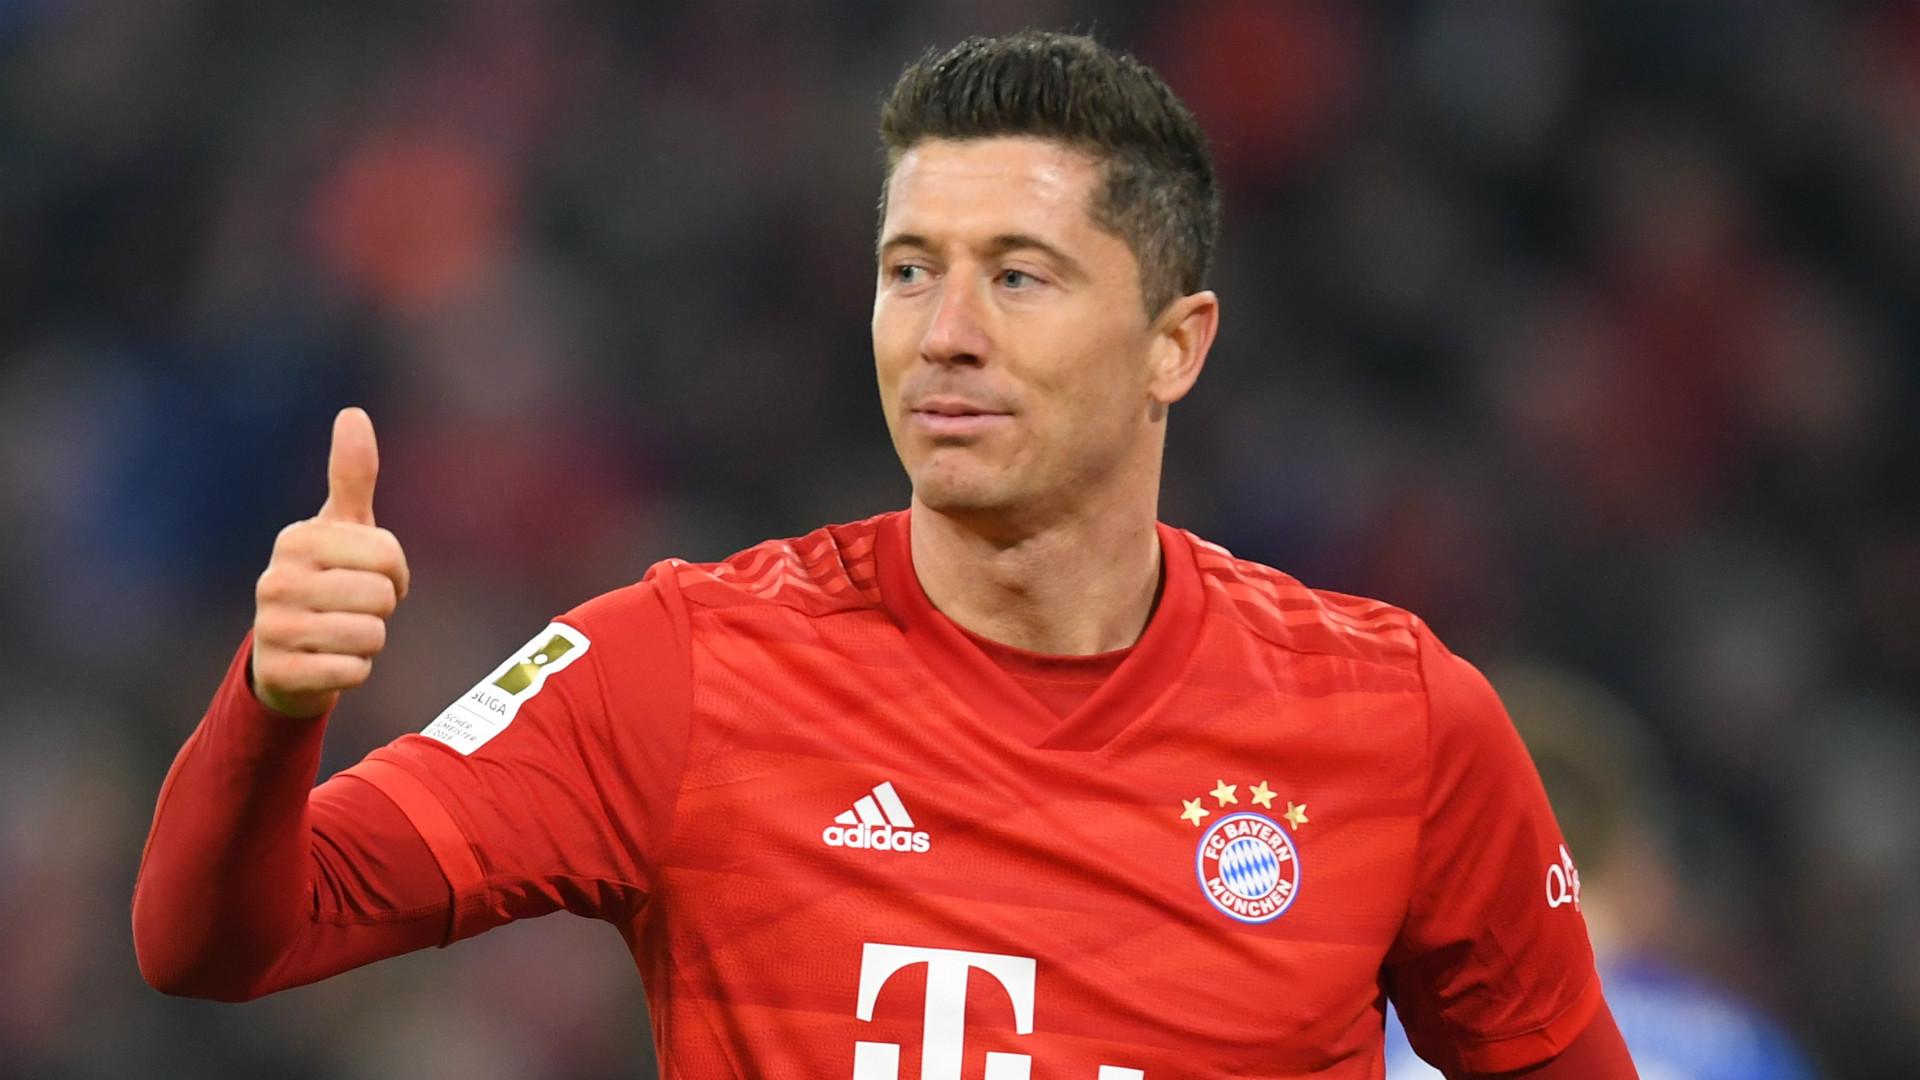 Bayern Munich's supremacy not good for Bundesliga - Elber